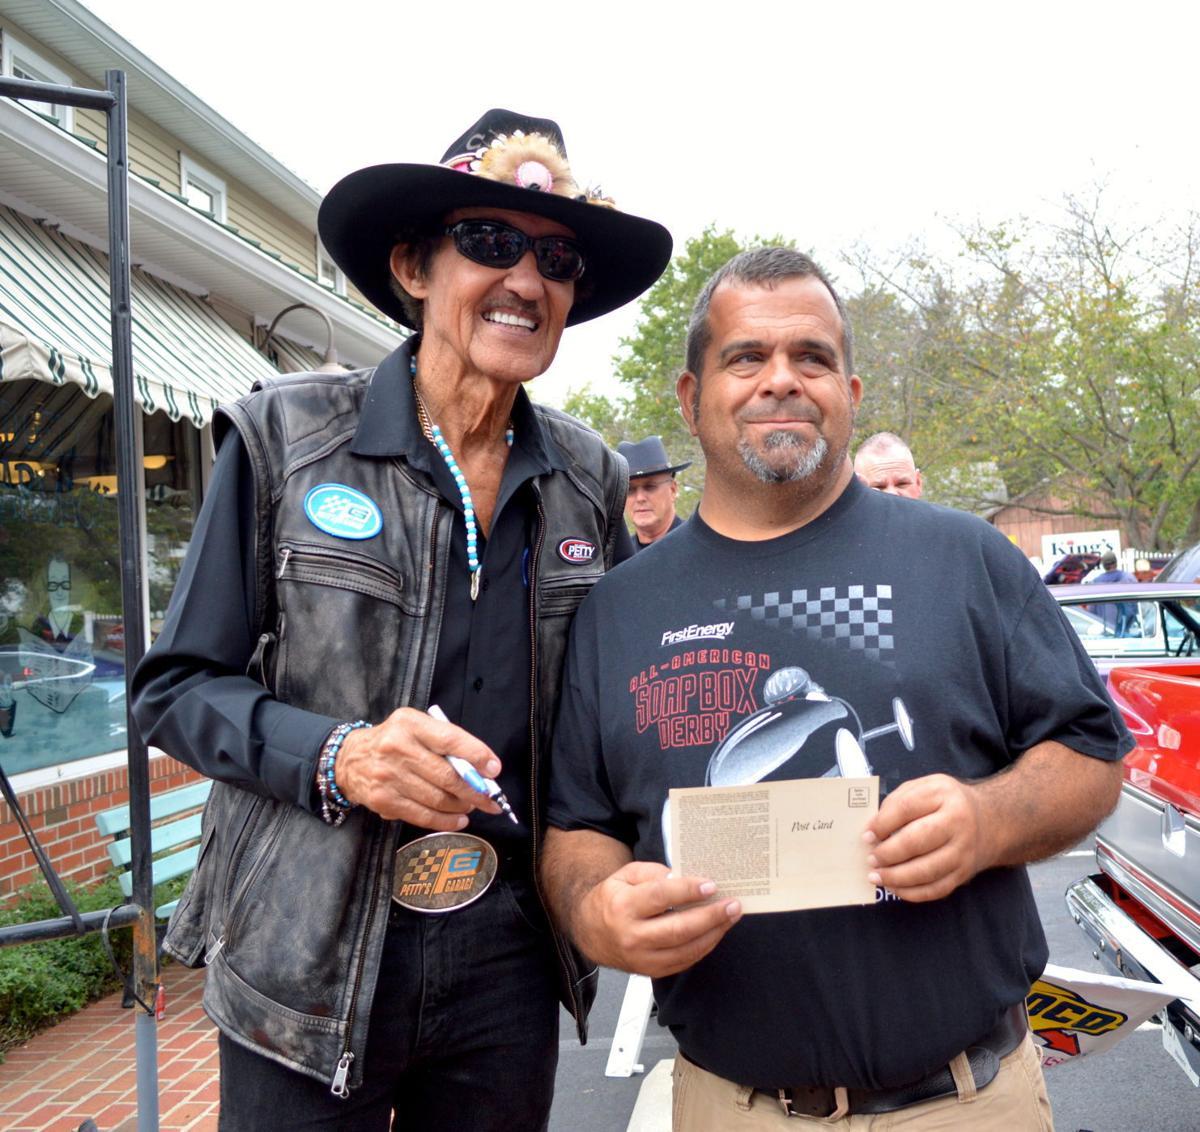 Richard Petty Returns To 'Petty North' In Ridgely